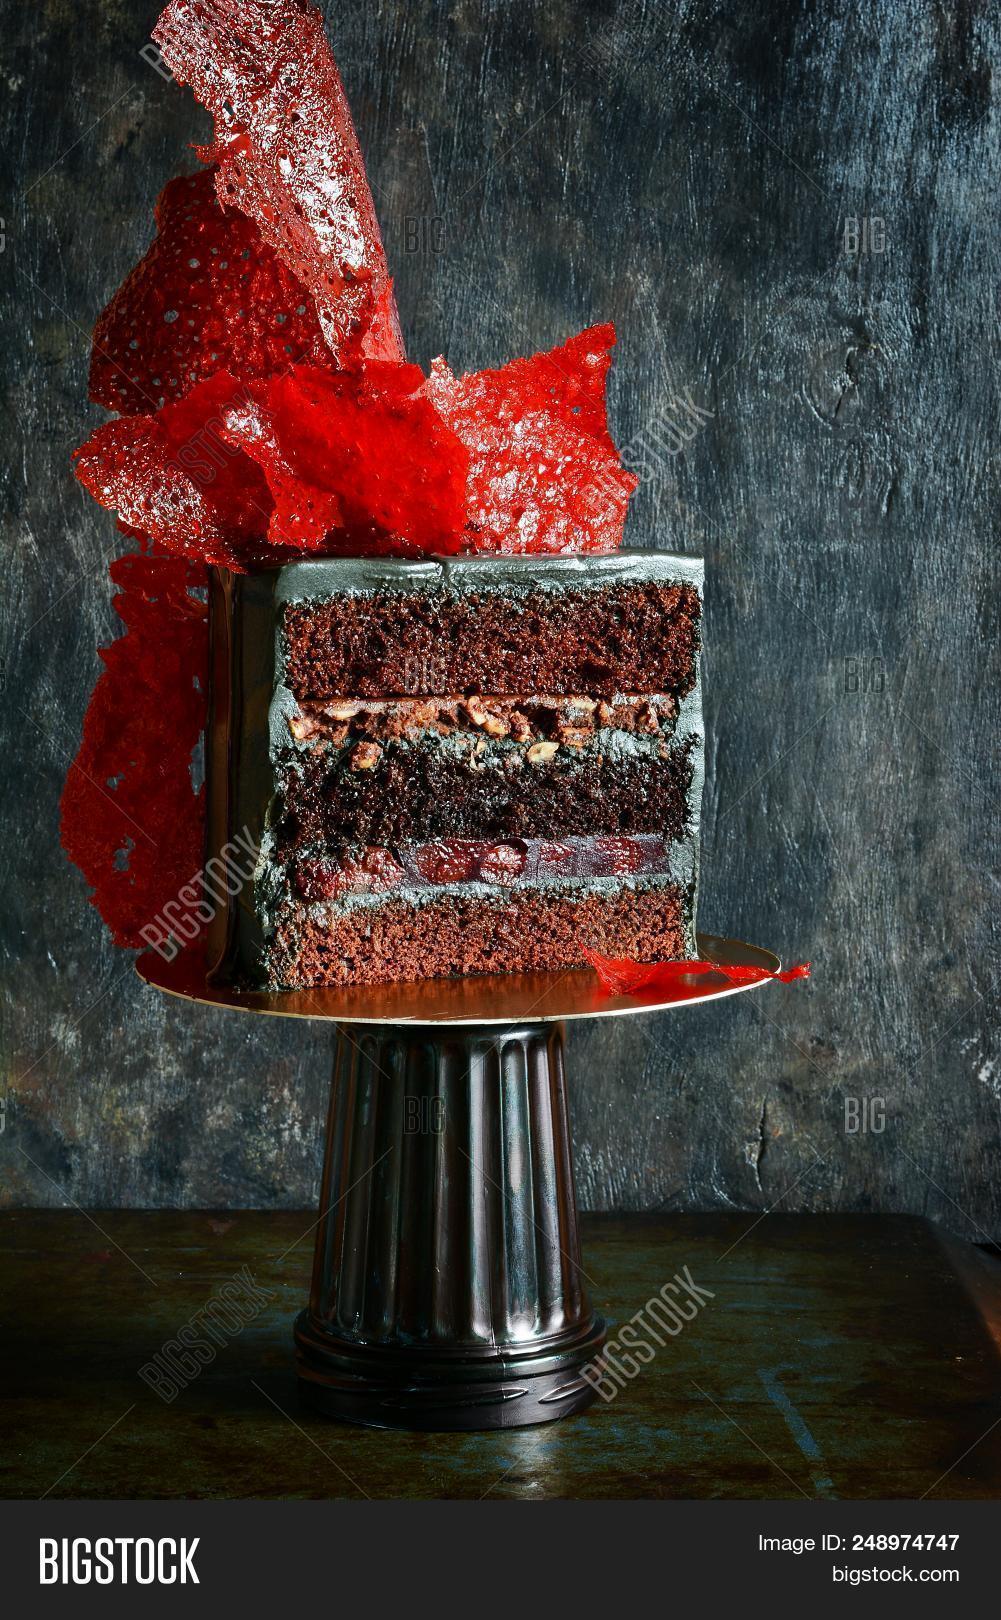 Marvelous Extravagant Cake Black Image Photo Free Trial Bigstock Funny Birthday Cards Online Necthendildamsfinfo